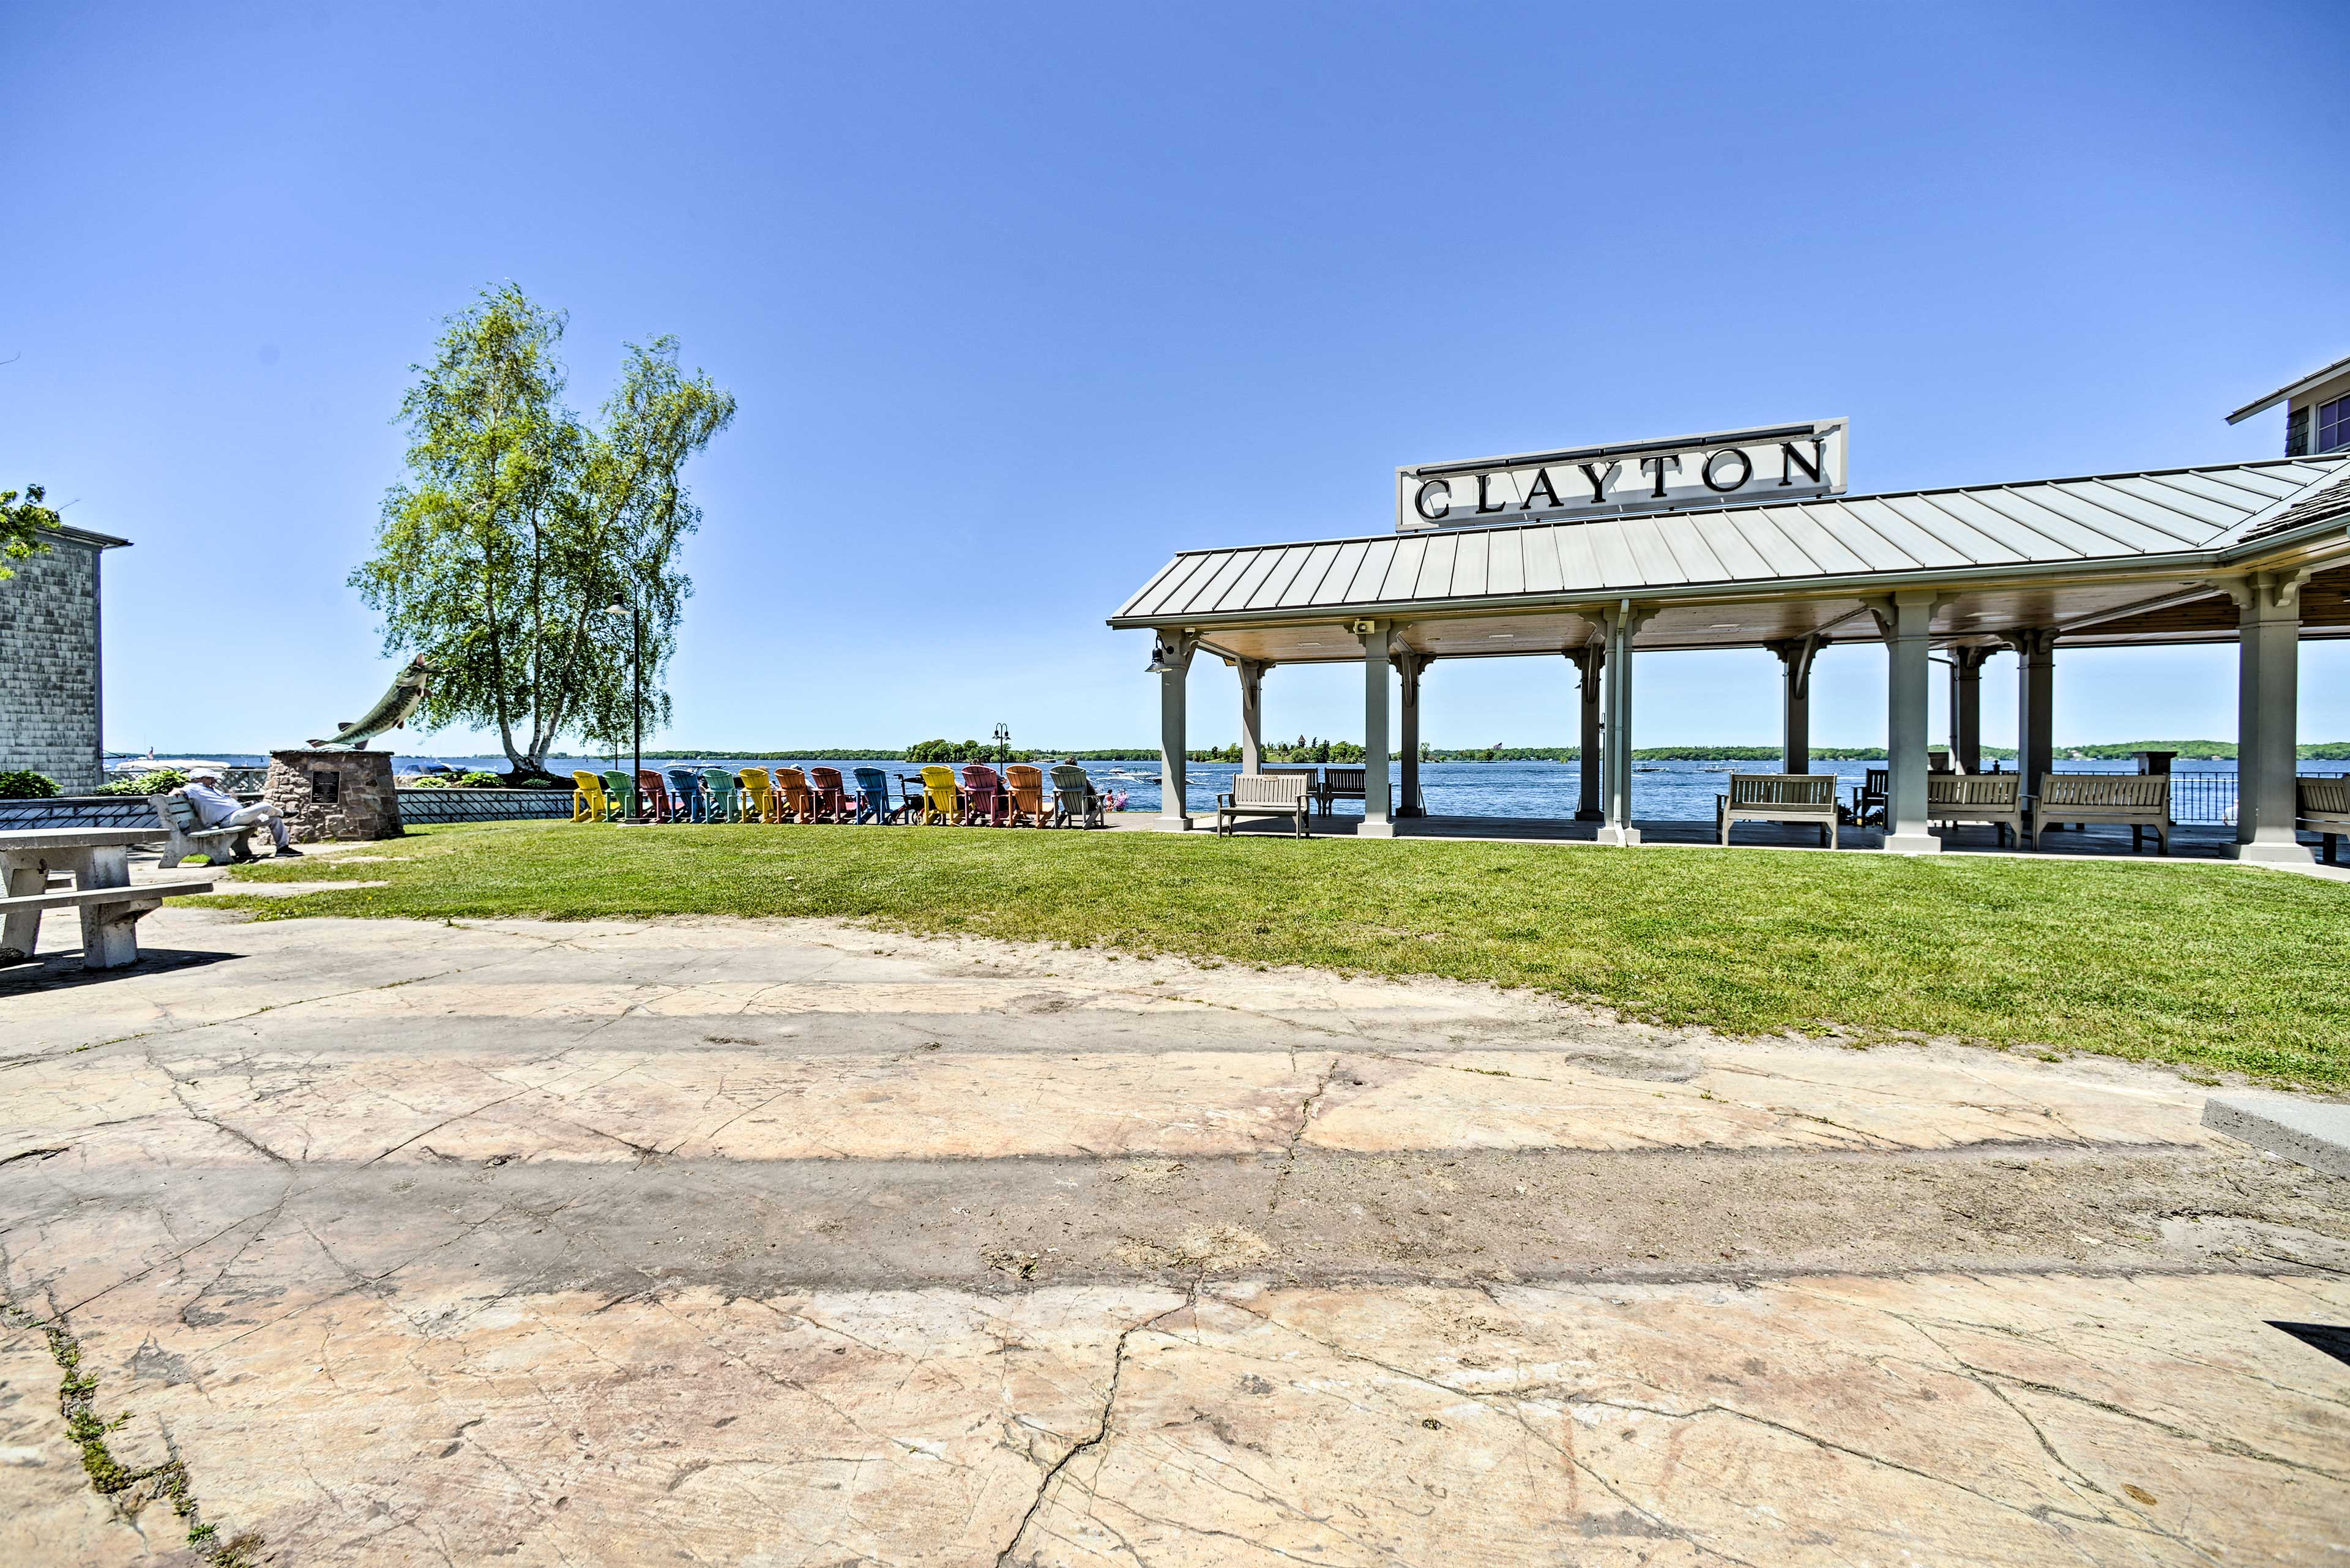 Frink Park and the Clayton Harbor Municipal Marina are just a short walk away!